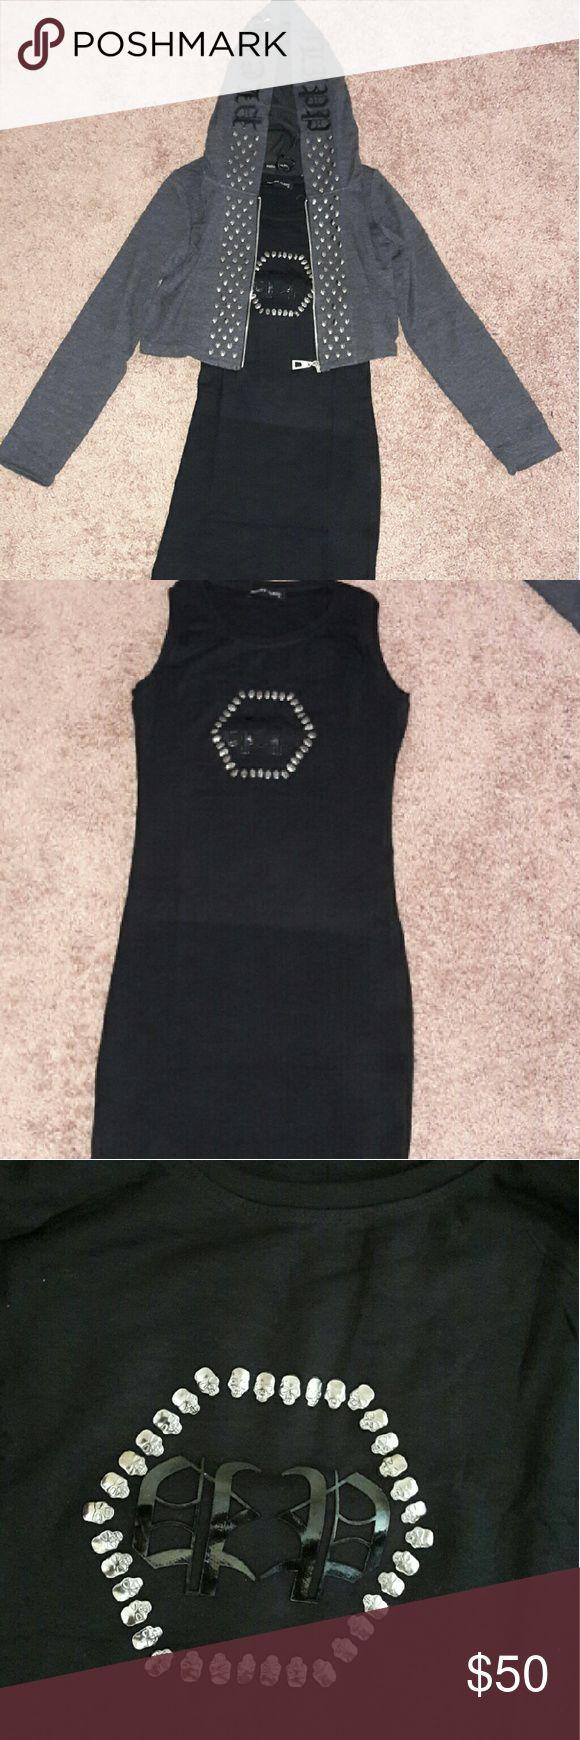 Philipp plein 100 % AUTHENTIC black  dress Fashion skull black dress with skull  jacket Dresses Mini